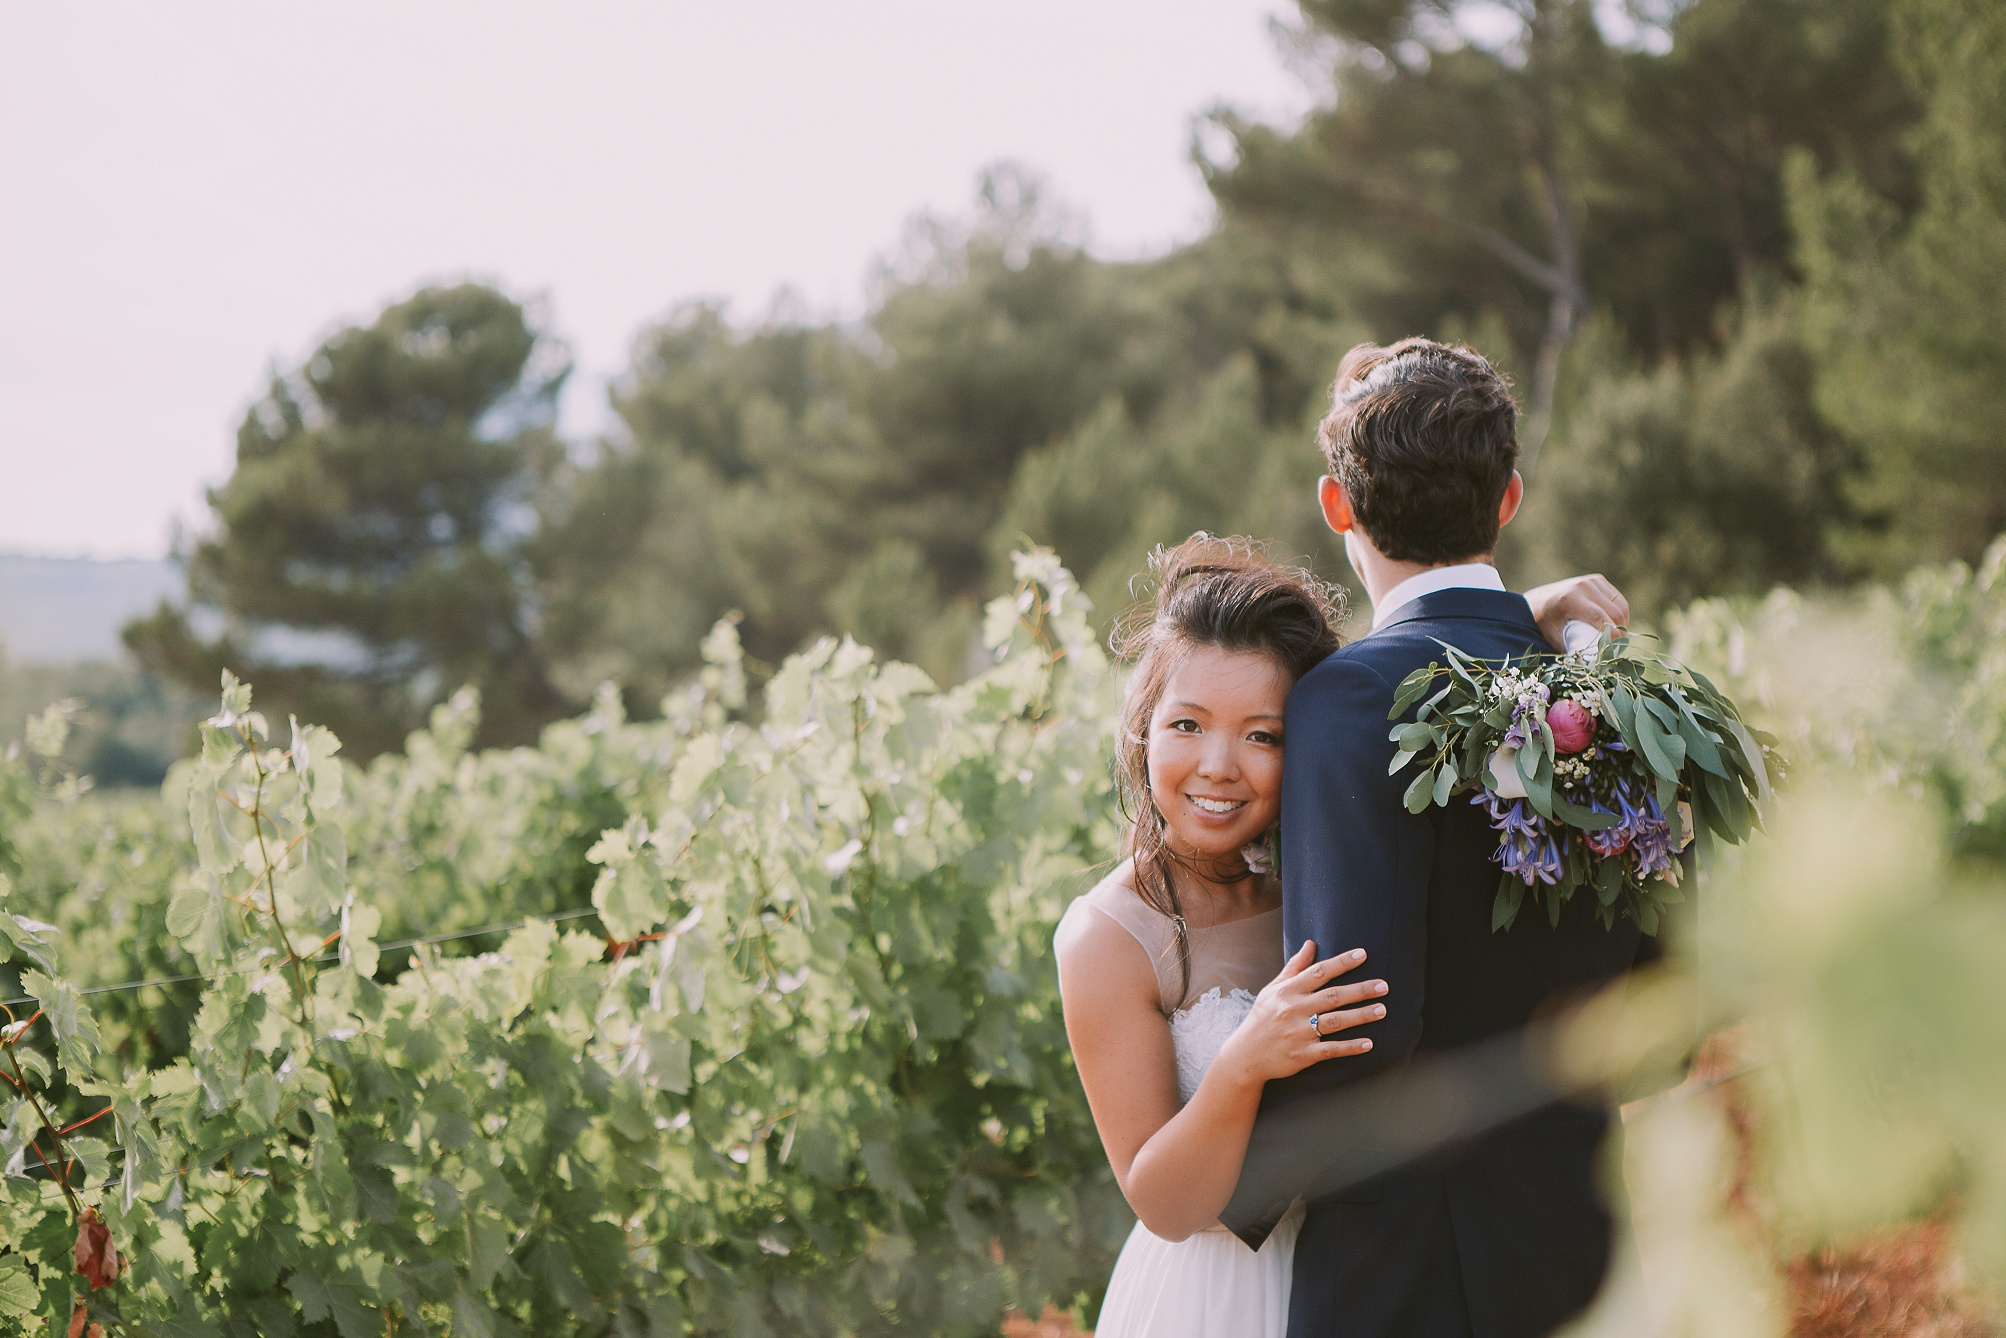 katerynaphotos-mariage-photographe-puyloubier-provence-aix-en-provence-sud-de-la-france_0401.jpg